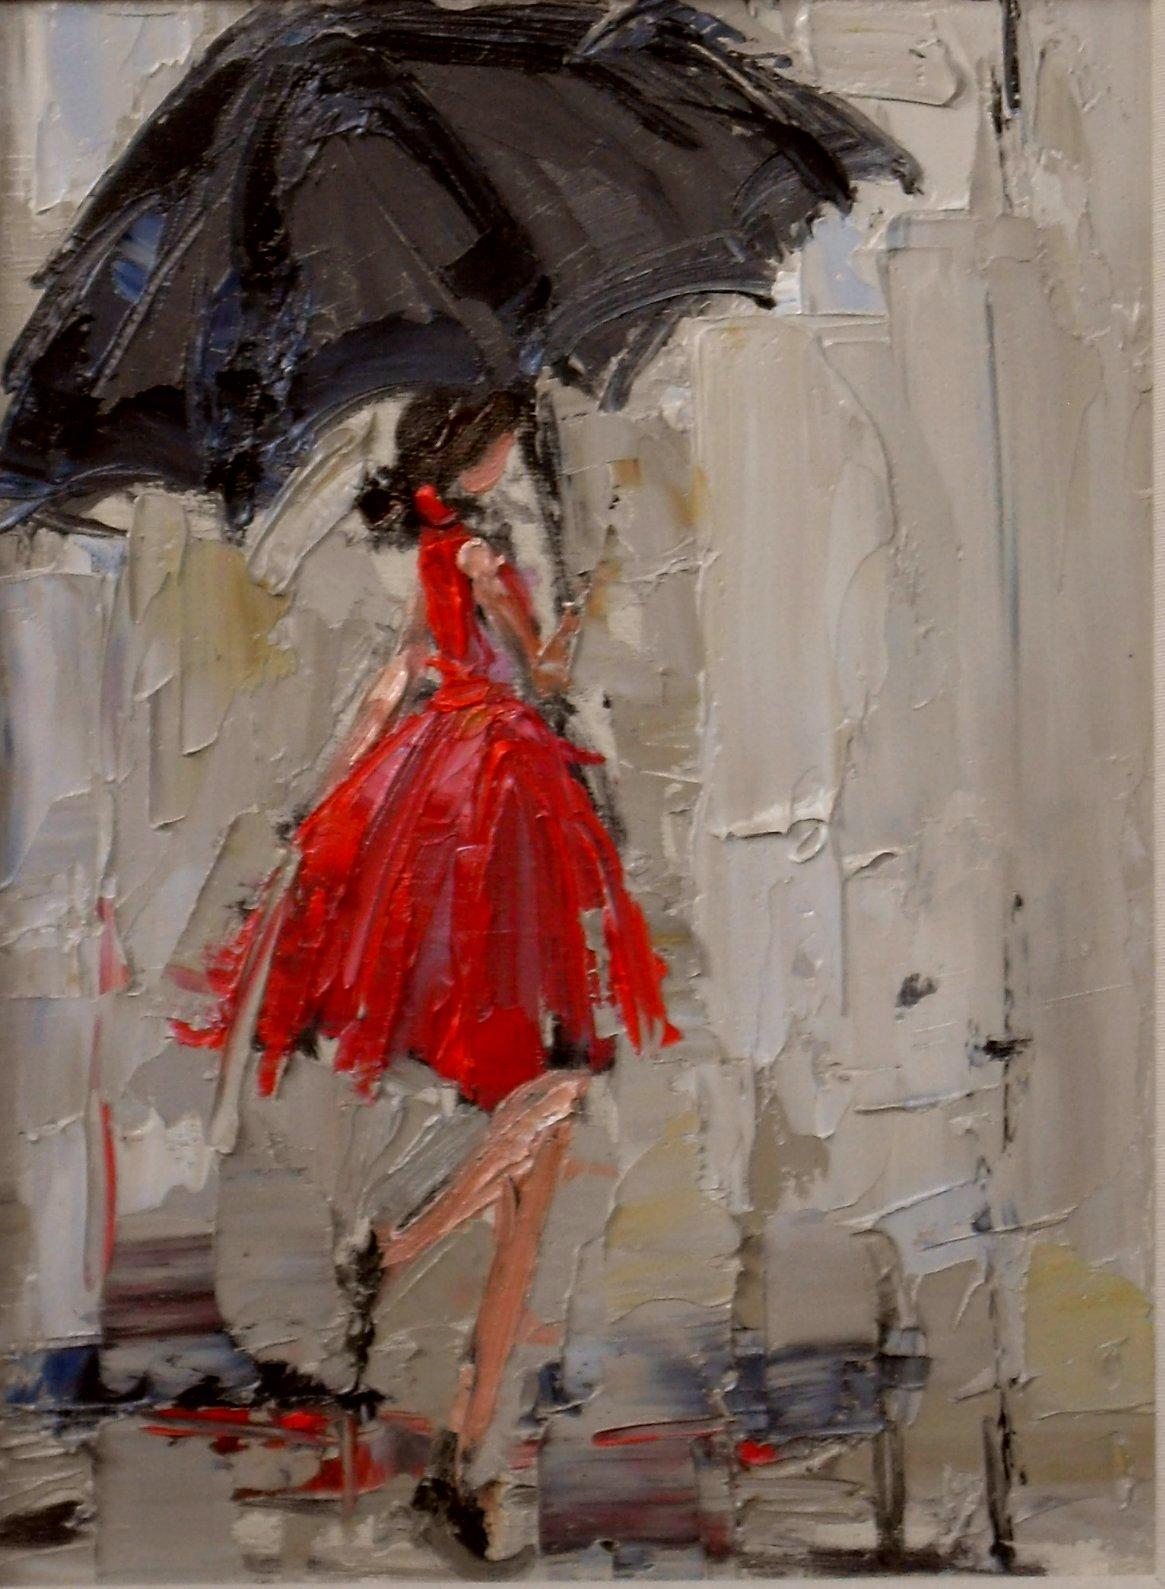 http://1.bp.blogspot.com/_PYu5e6_b_9o/THPpX5IAiTI/AAAAAAAAAmg/-wDUFqPitxU/s1600/dancing+in+the+rain+2.new.JPG